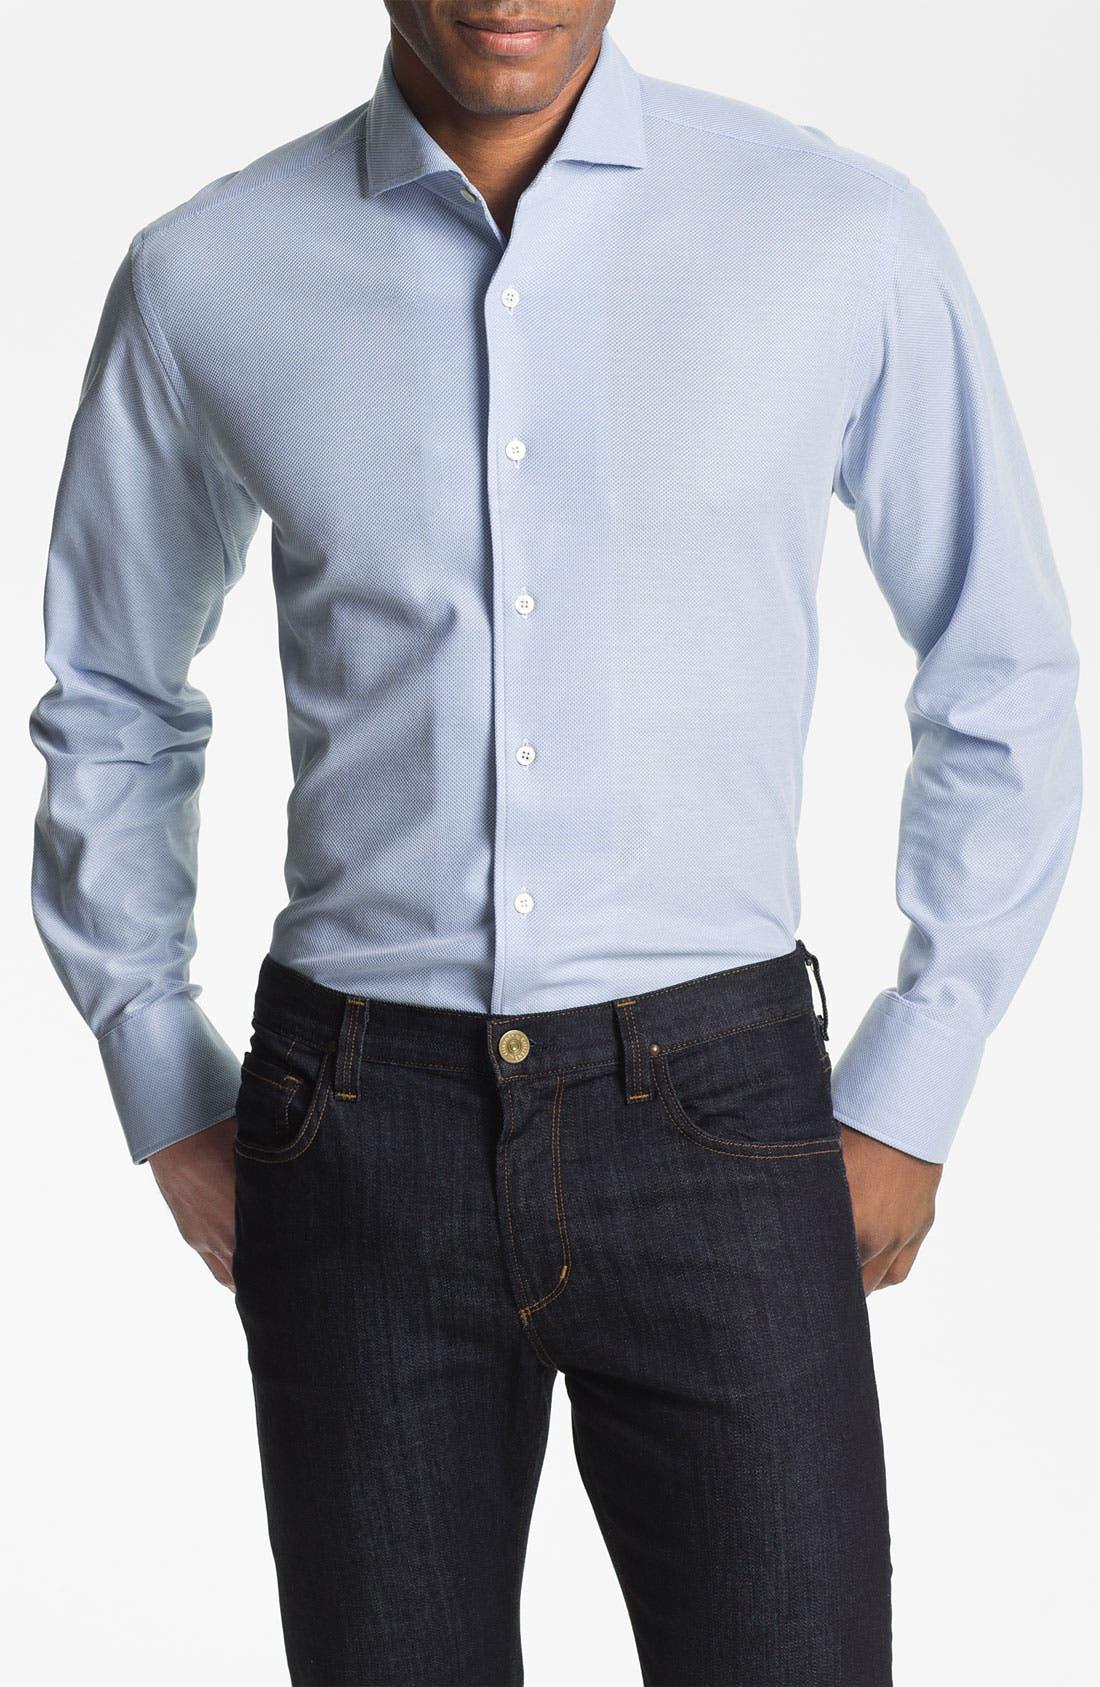 Alternate Image 1 Selected - Canali Regular Fit Knit Italian Sport Shirt